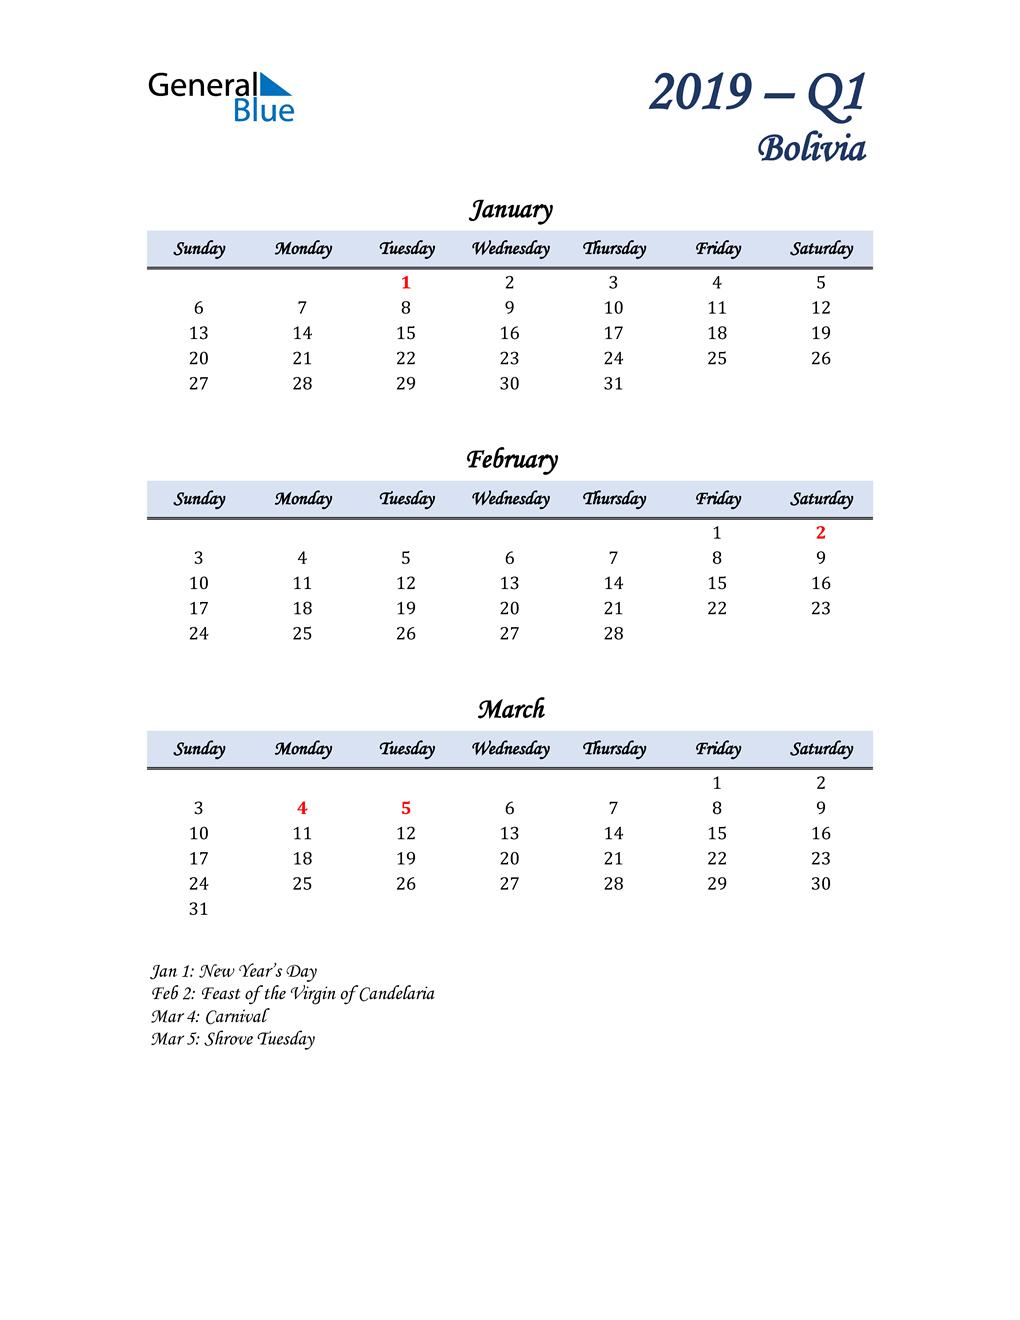 January, February, and March Calendar for Bolivia